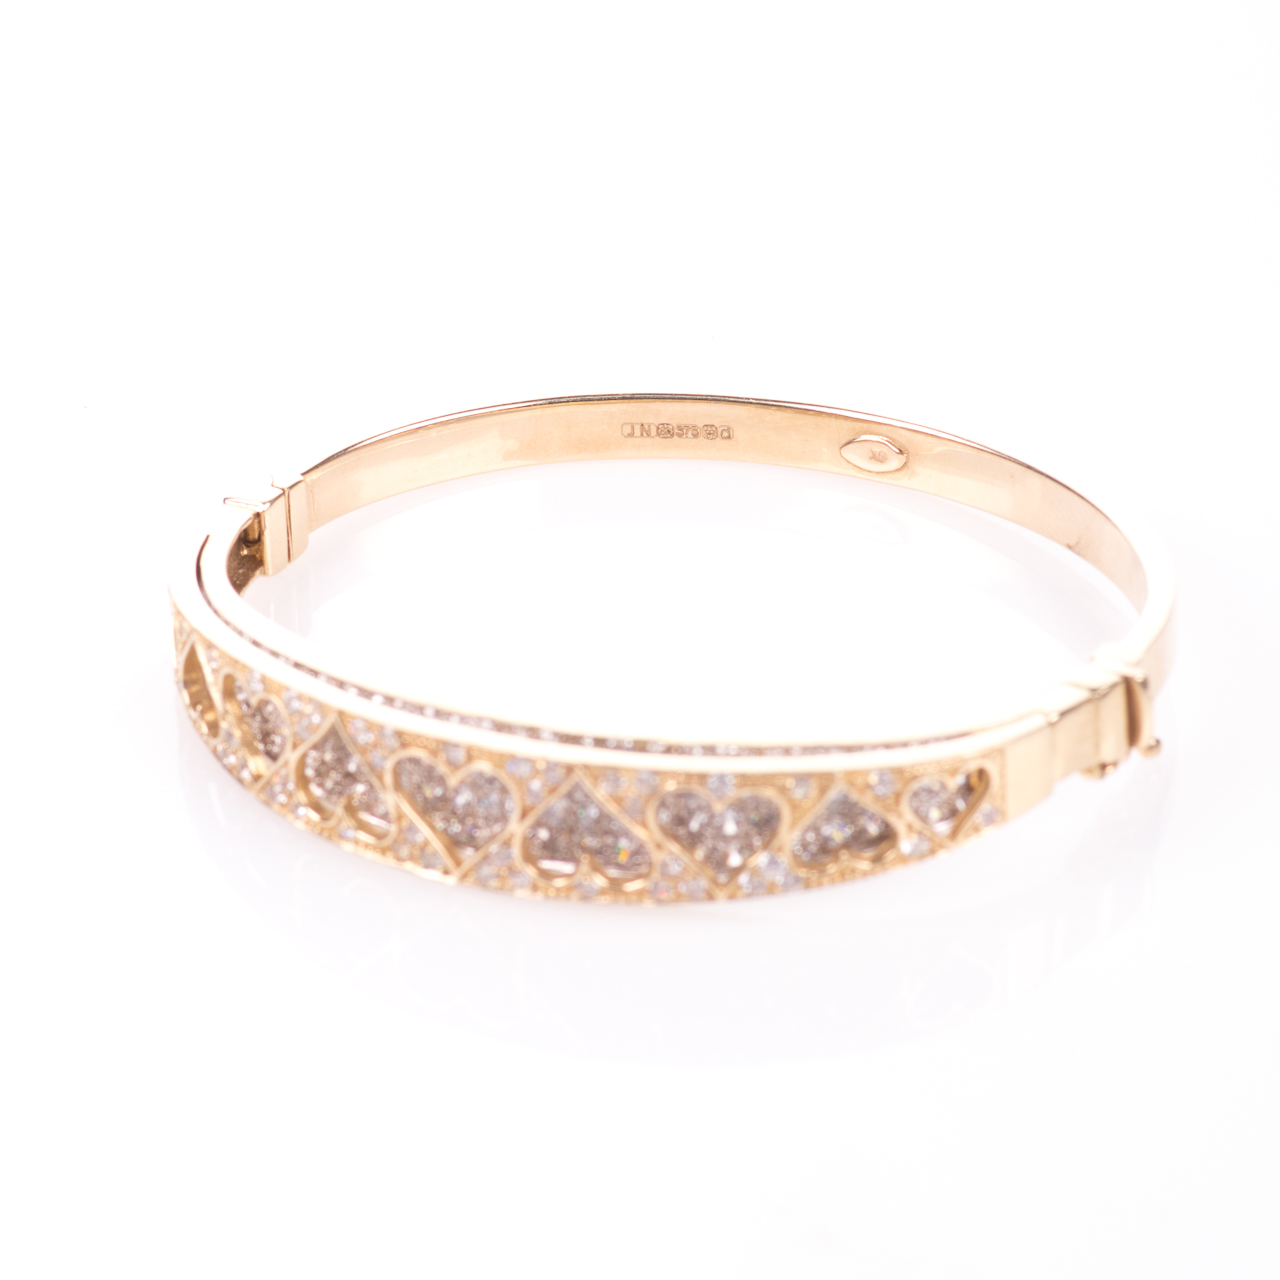 9ct Gold 4ct Diamond Heart Bangle Bracelet - Image 4 of 7